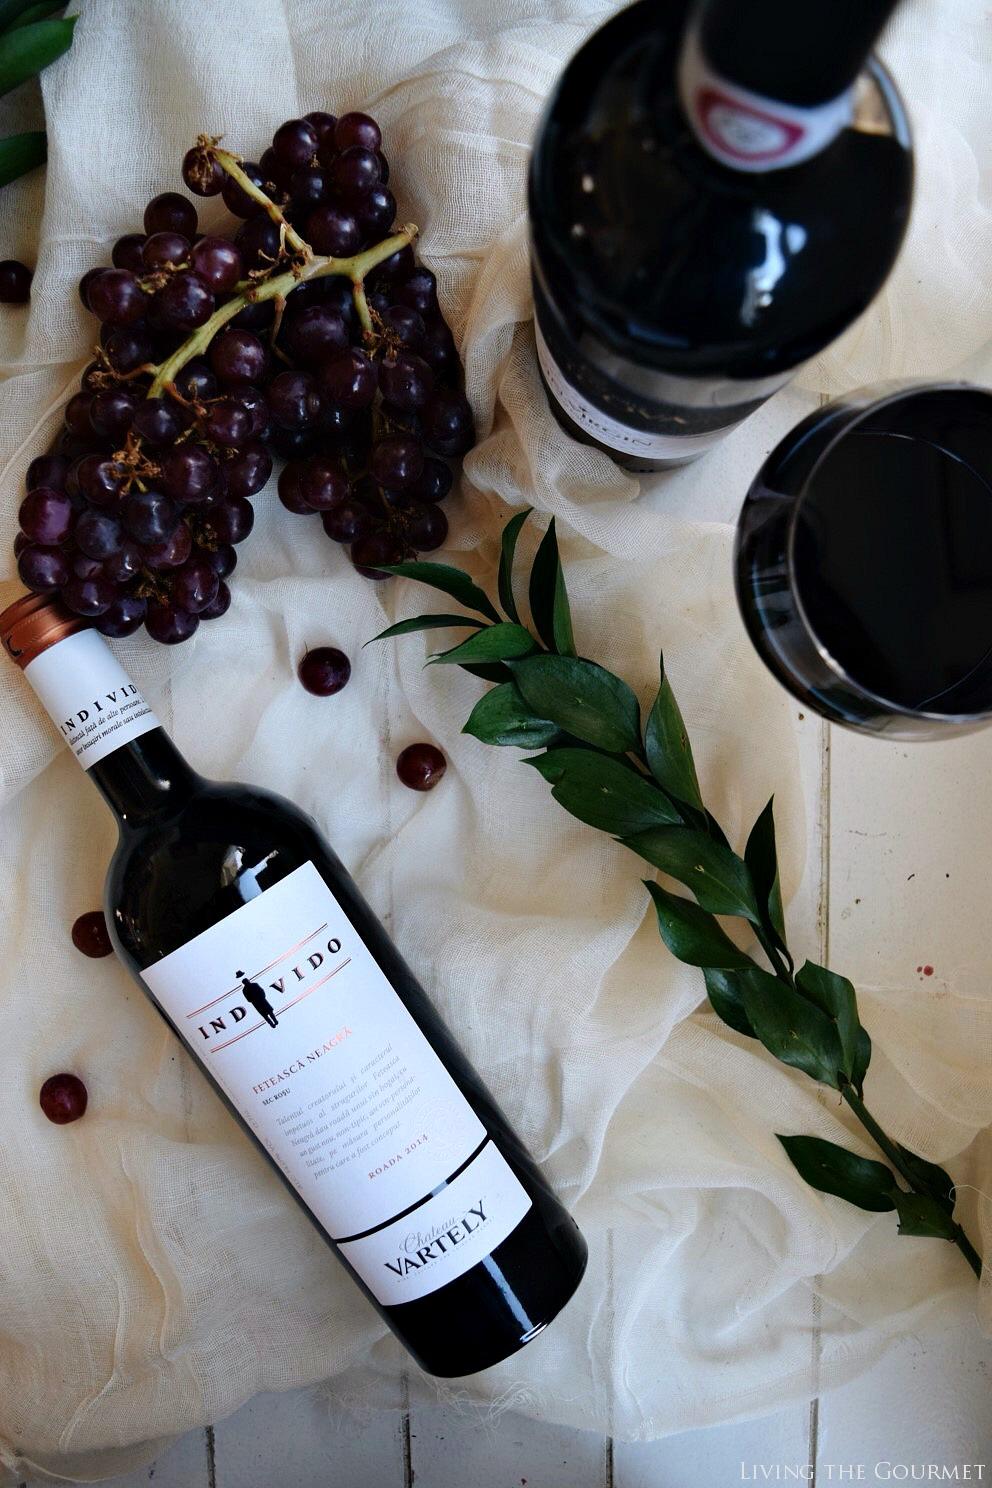 Living the Gourmet: Wines of Maldova